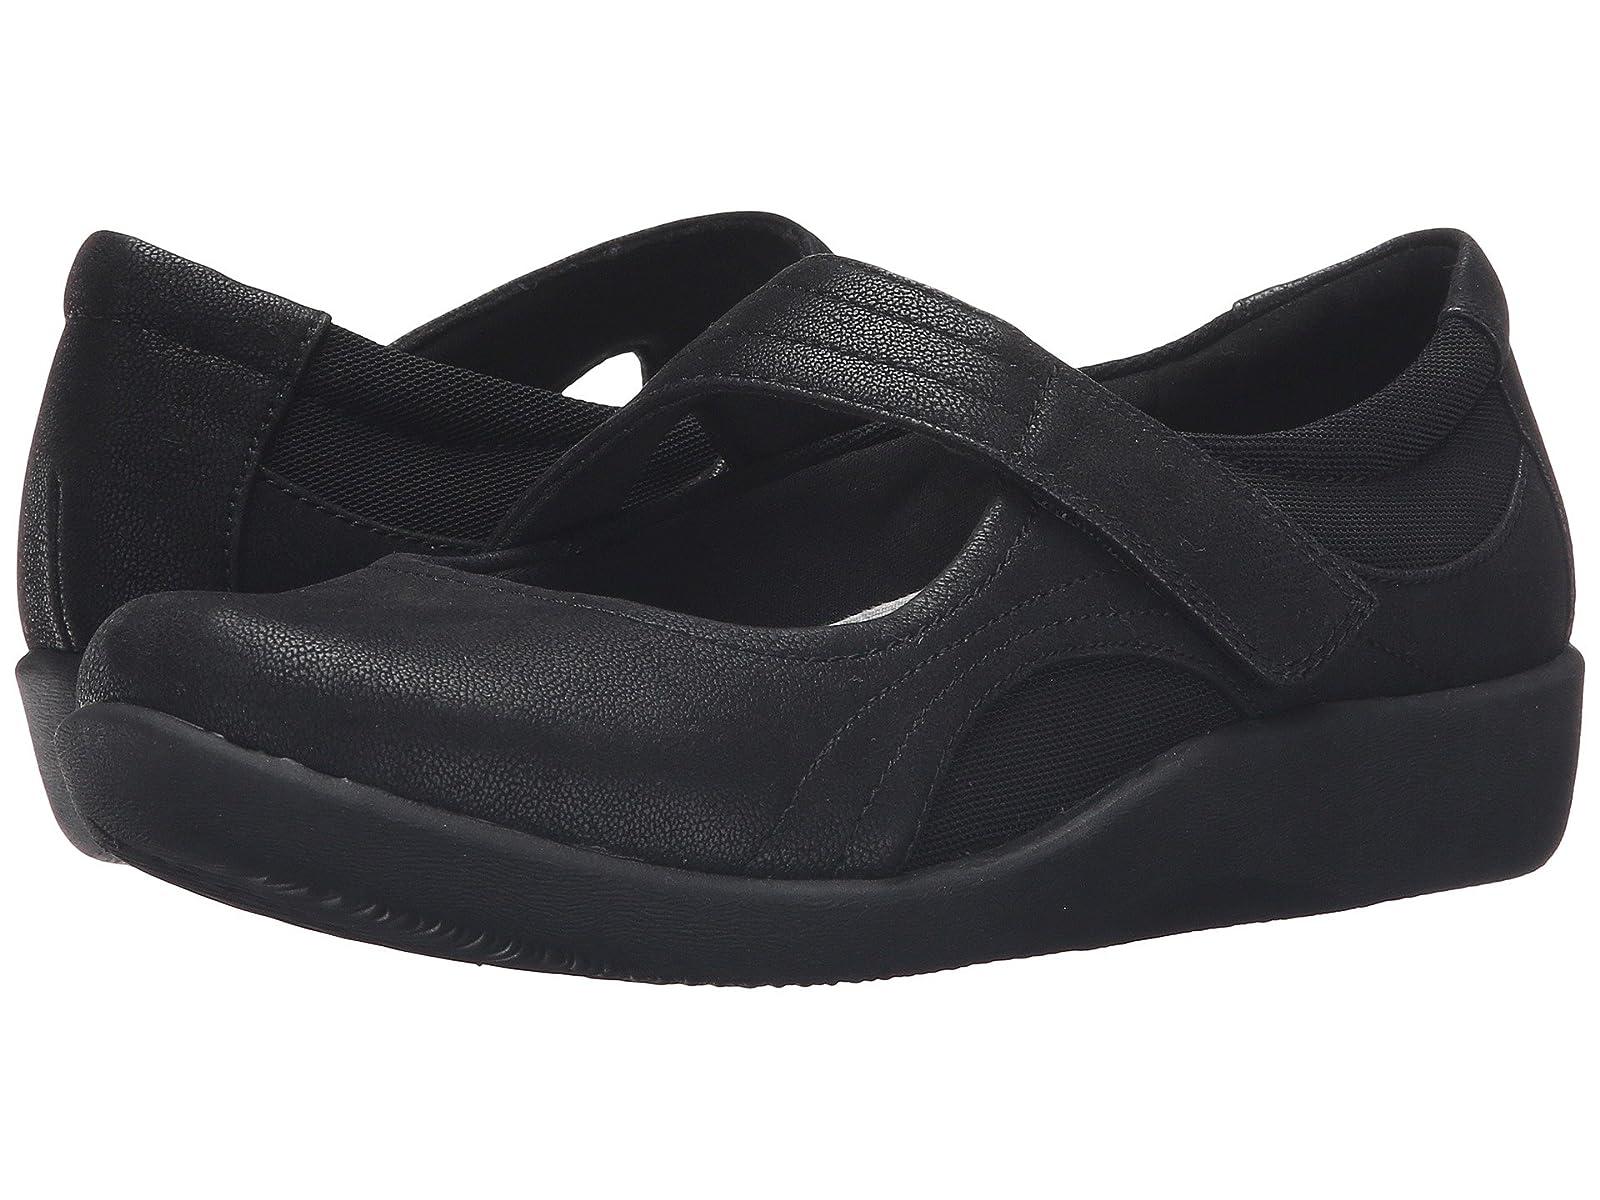 Clarks Sillian BellaAtmospheric grades have affordable shoes